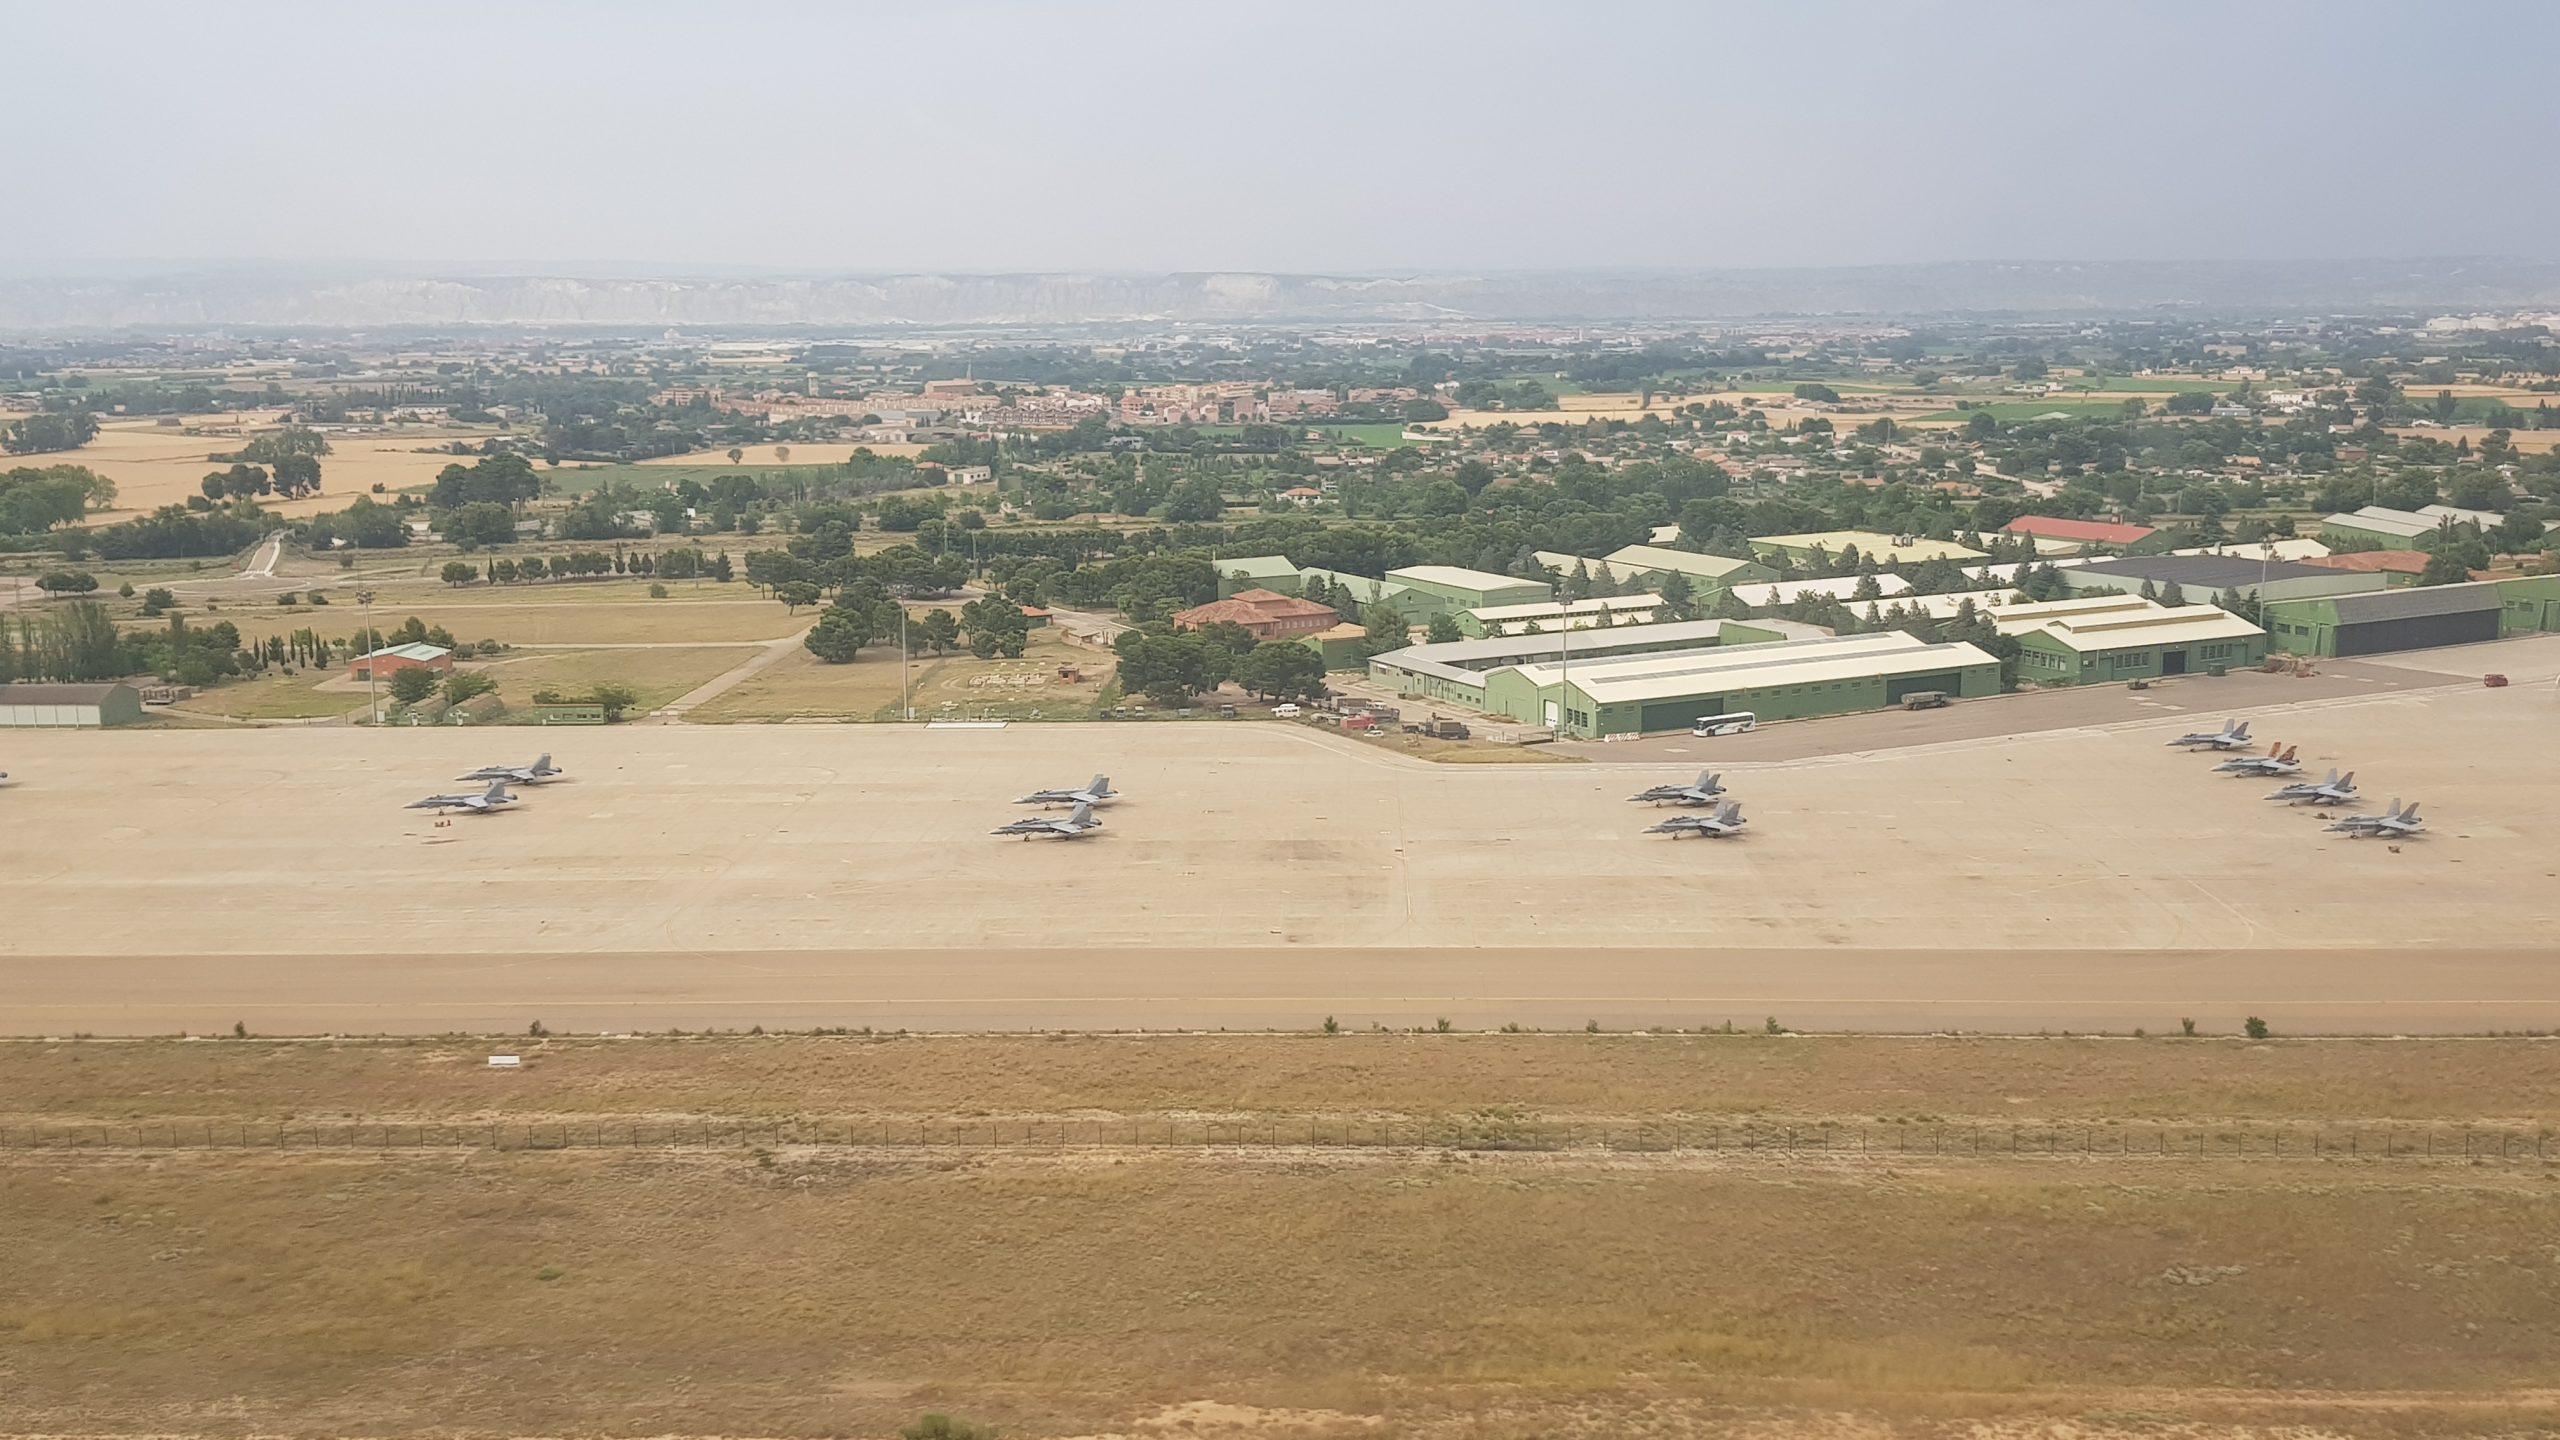 Spanish Military Airbase